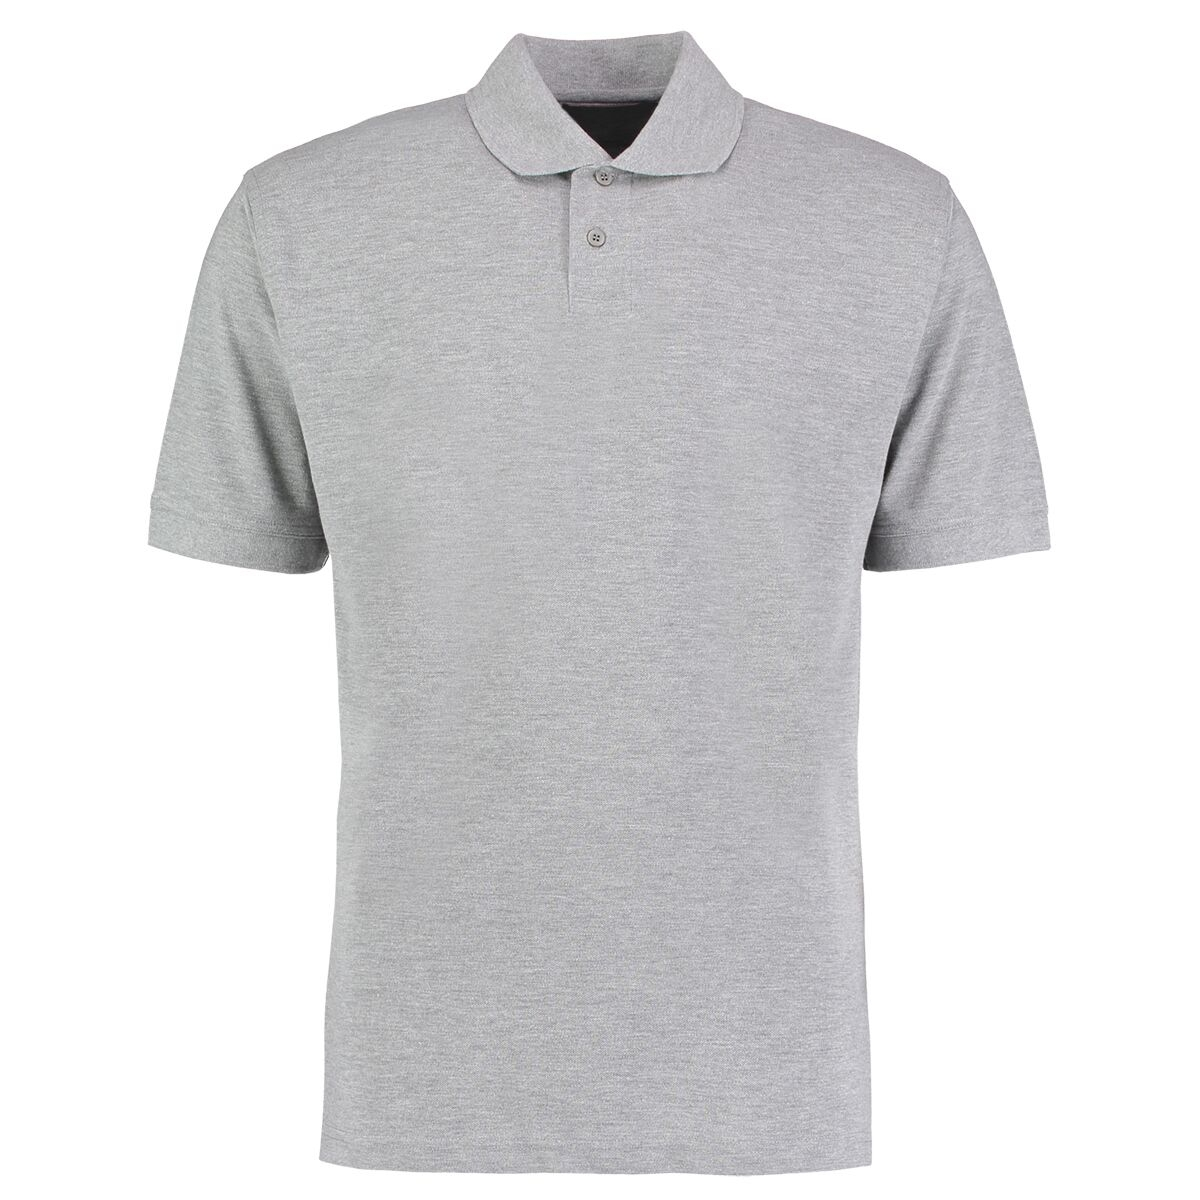 Prestige Edge Prestige Edge Short Sleeves Classic Polo Shirt For